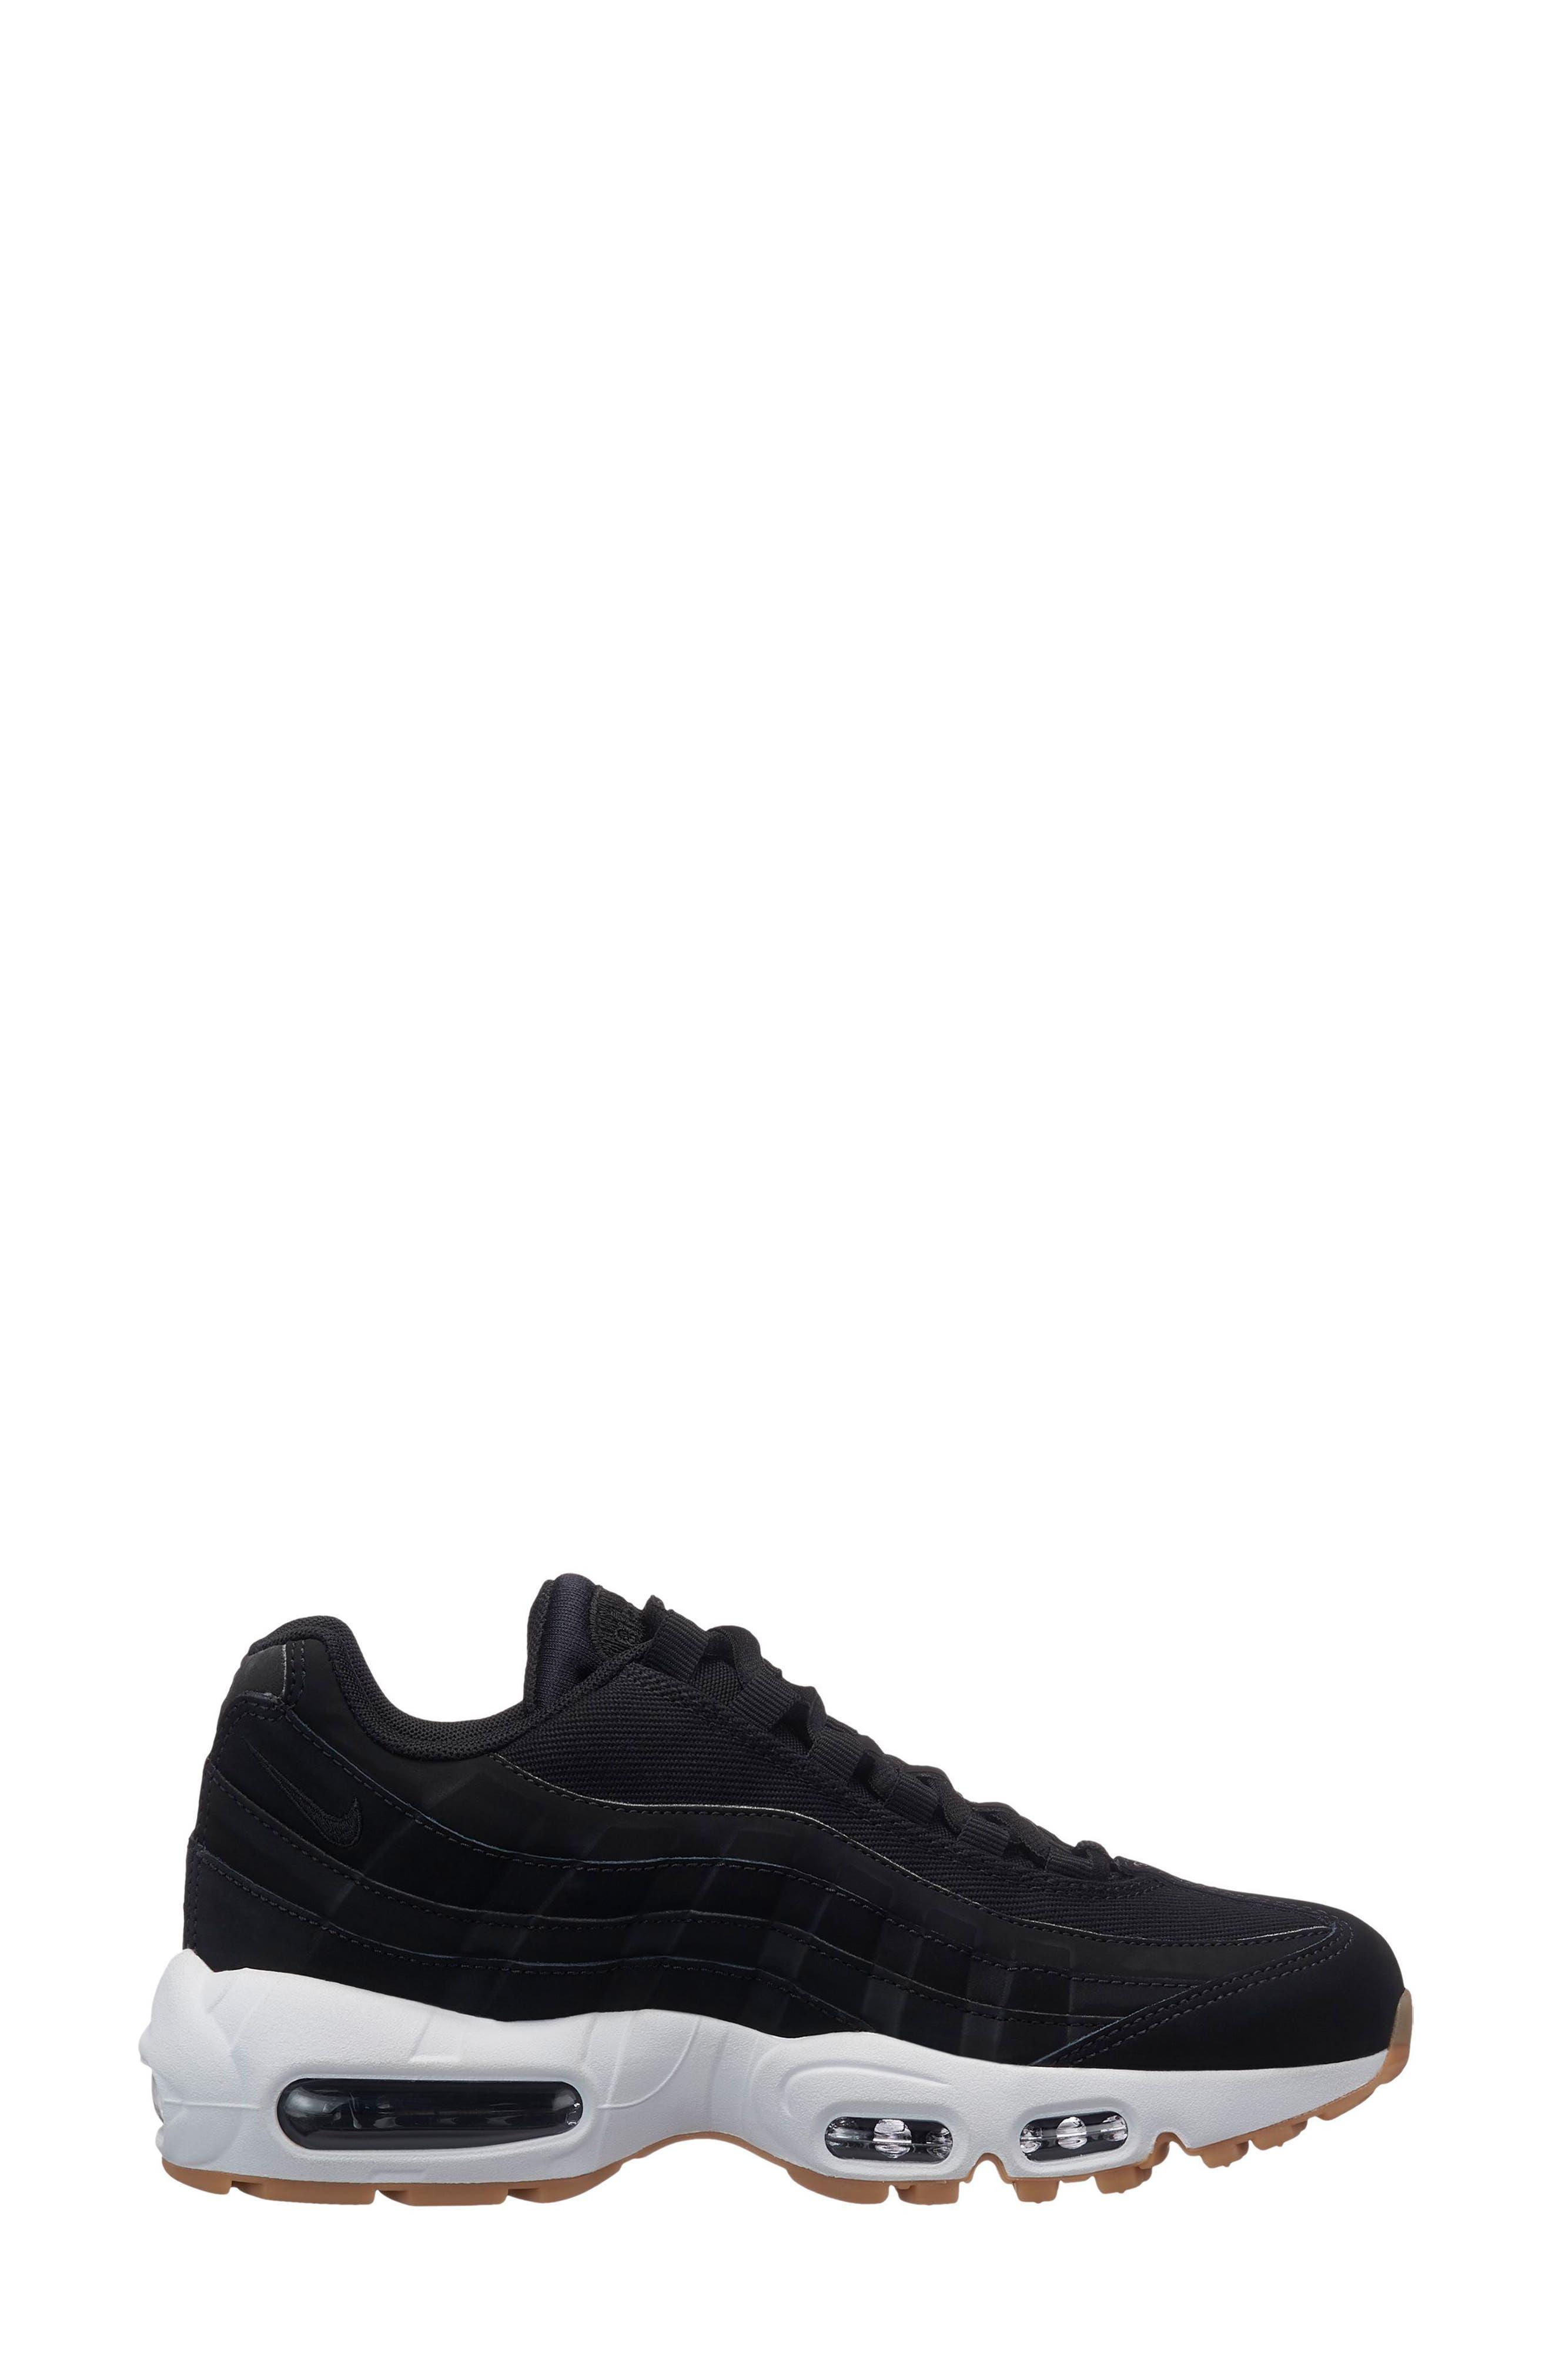 Air Max 95 Running Shoe,                         Main,                         color, BLACK